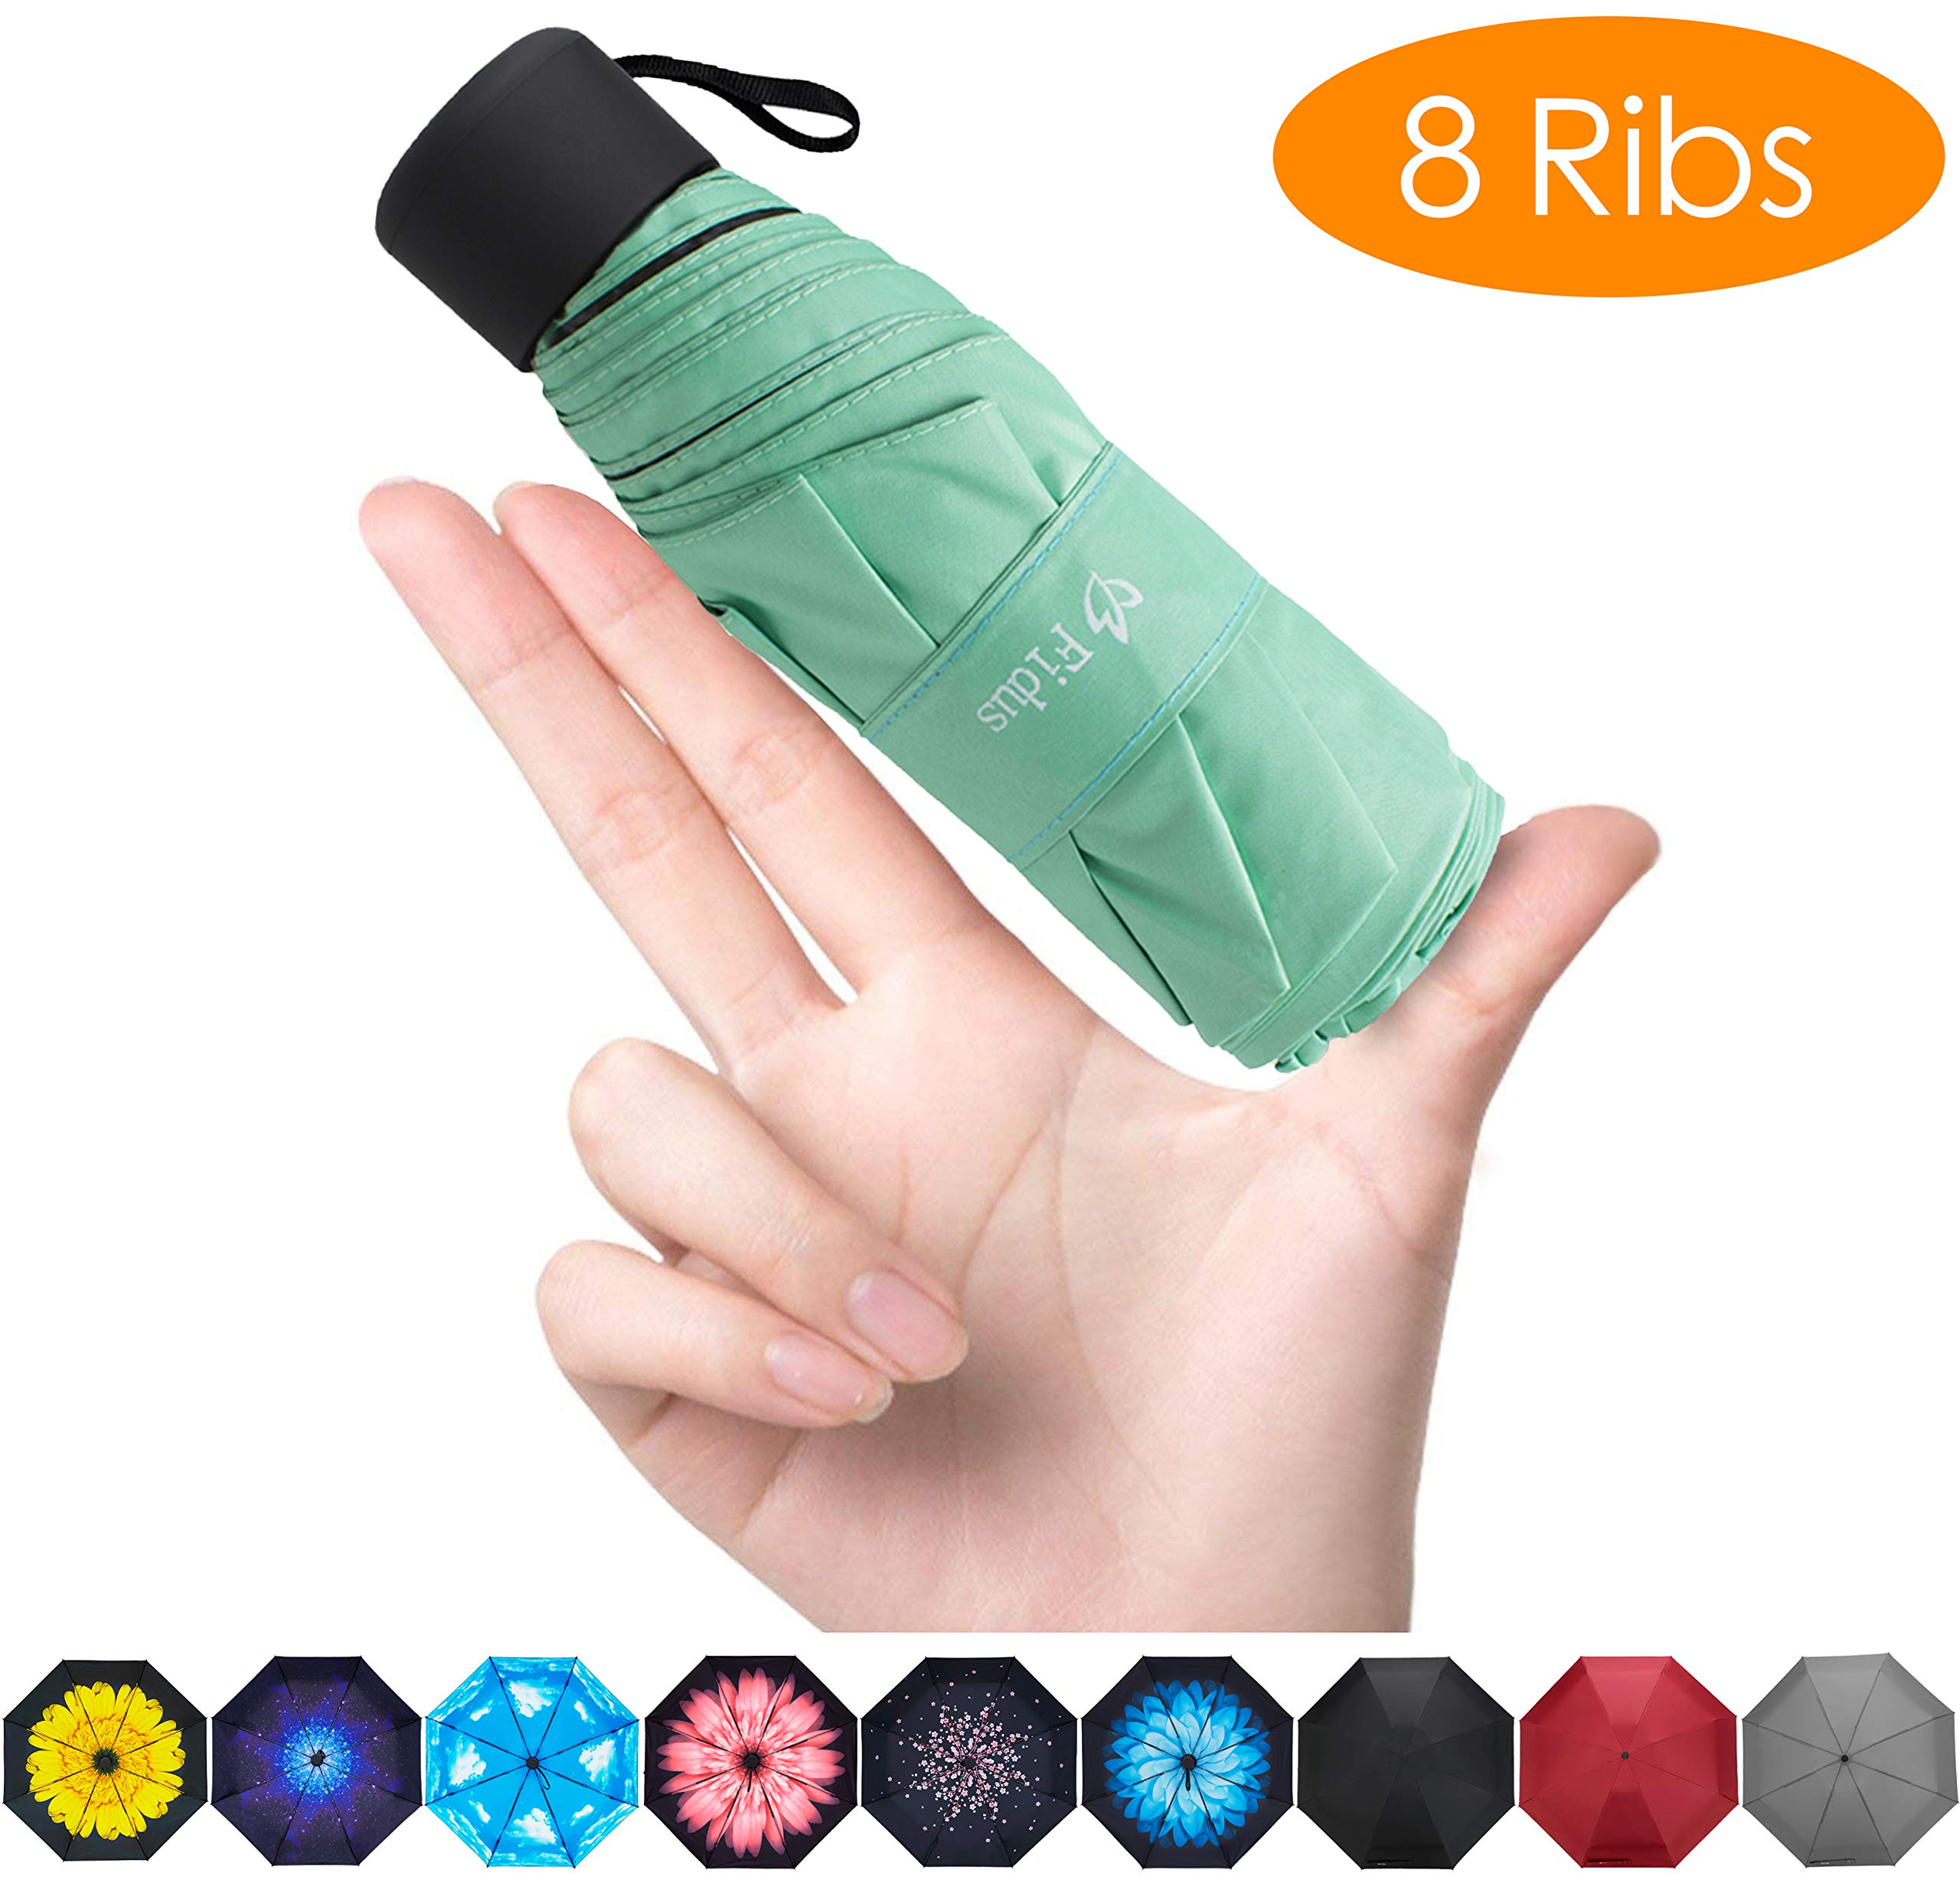 FidusUpgraded 8 Ribs Mini Portable Sun&Rain Lightweight WindproofUmbrella - Compact Parasol Outdoor Travel Umbrella for MenWomen Kids-Green by Fidus